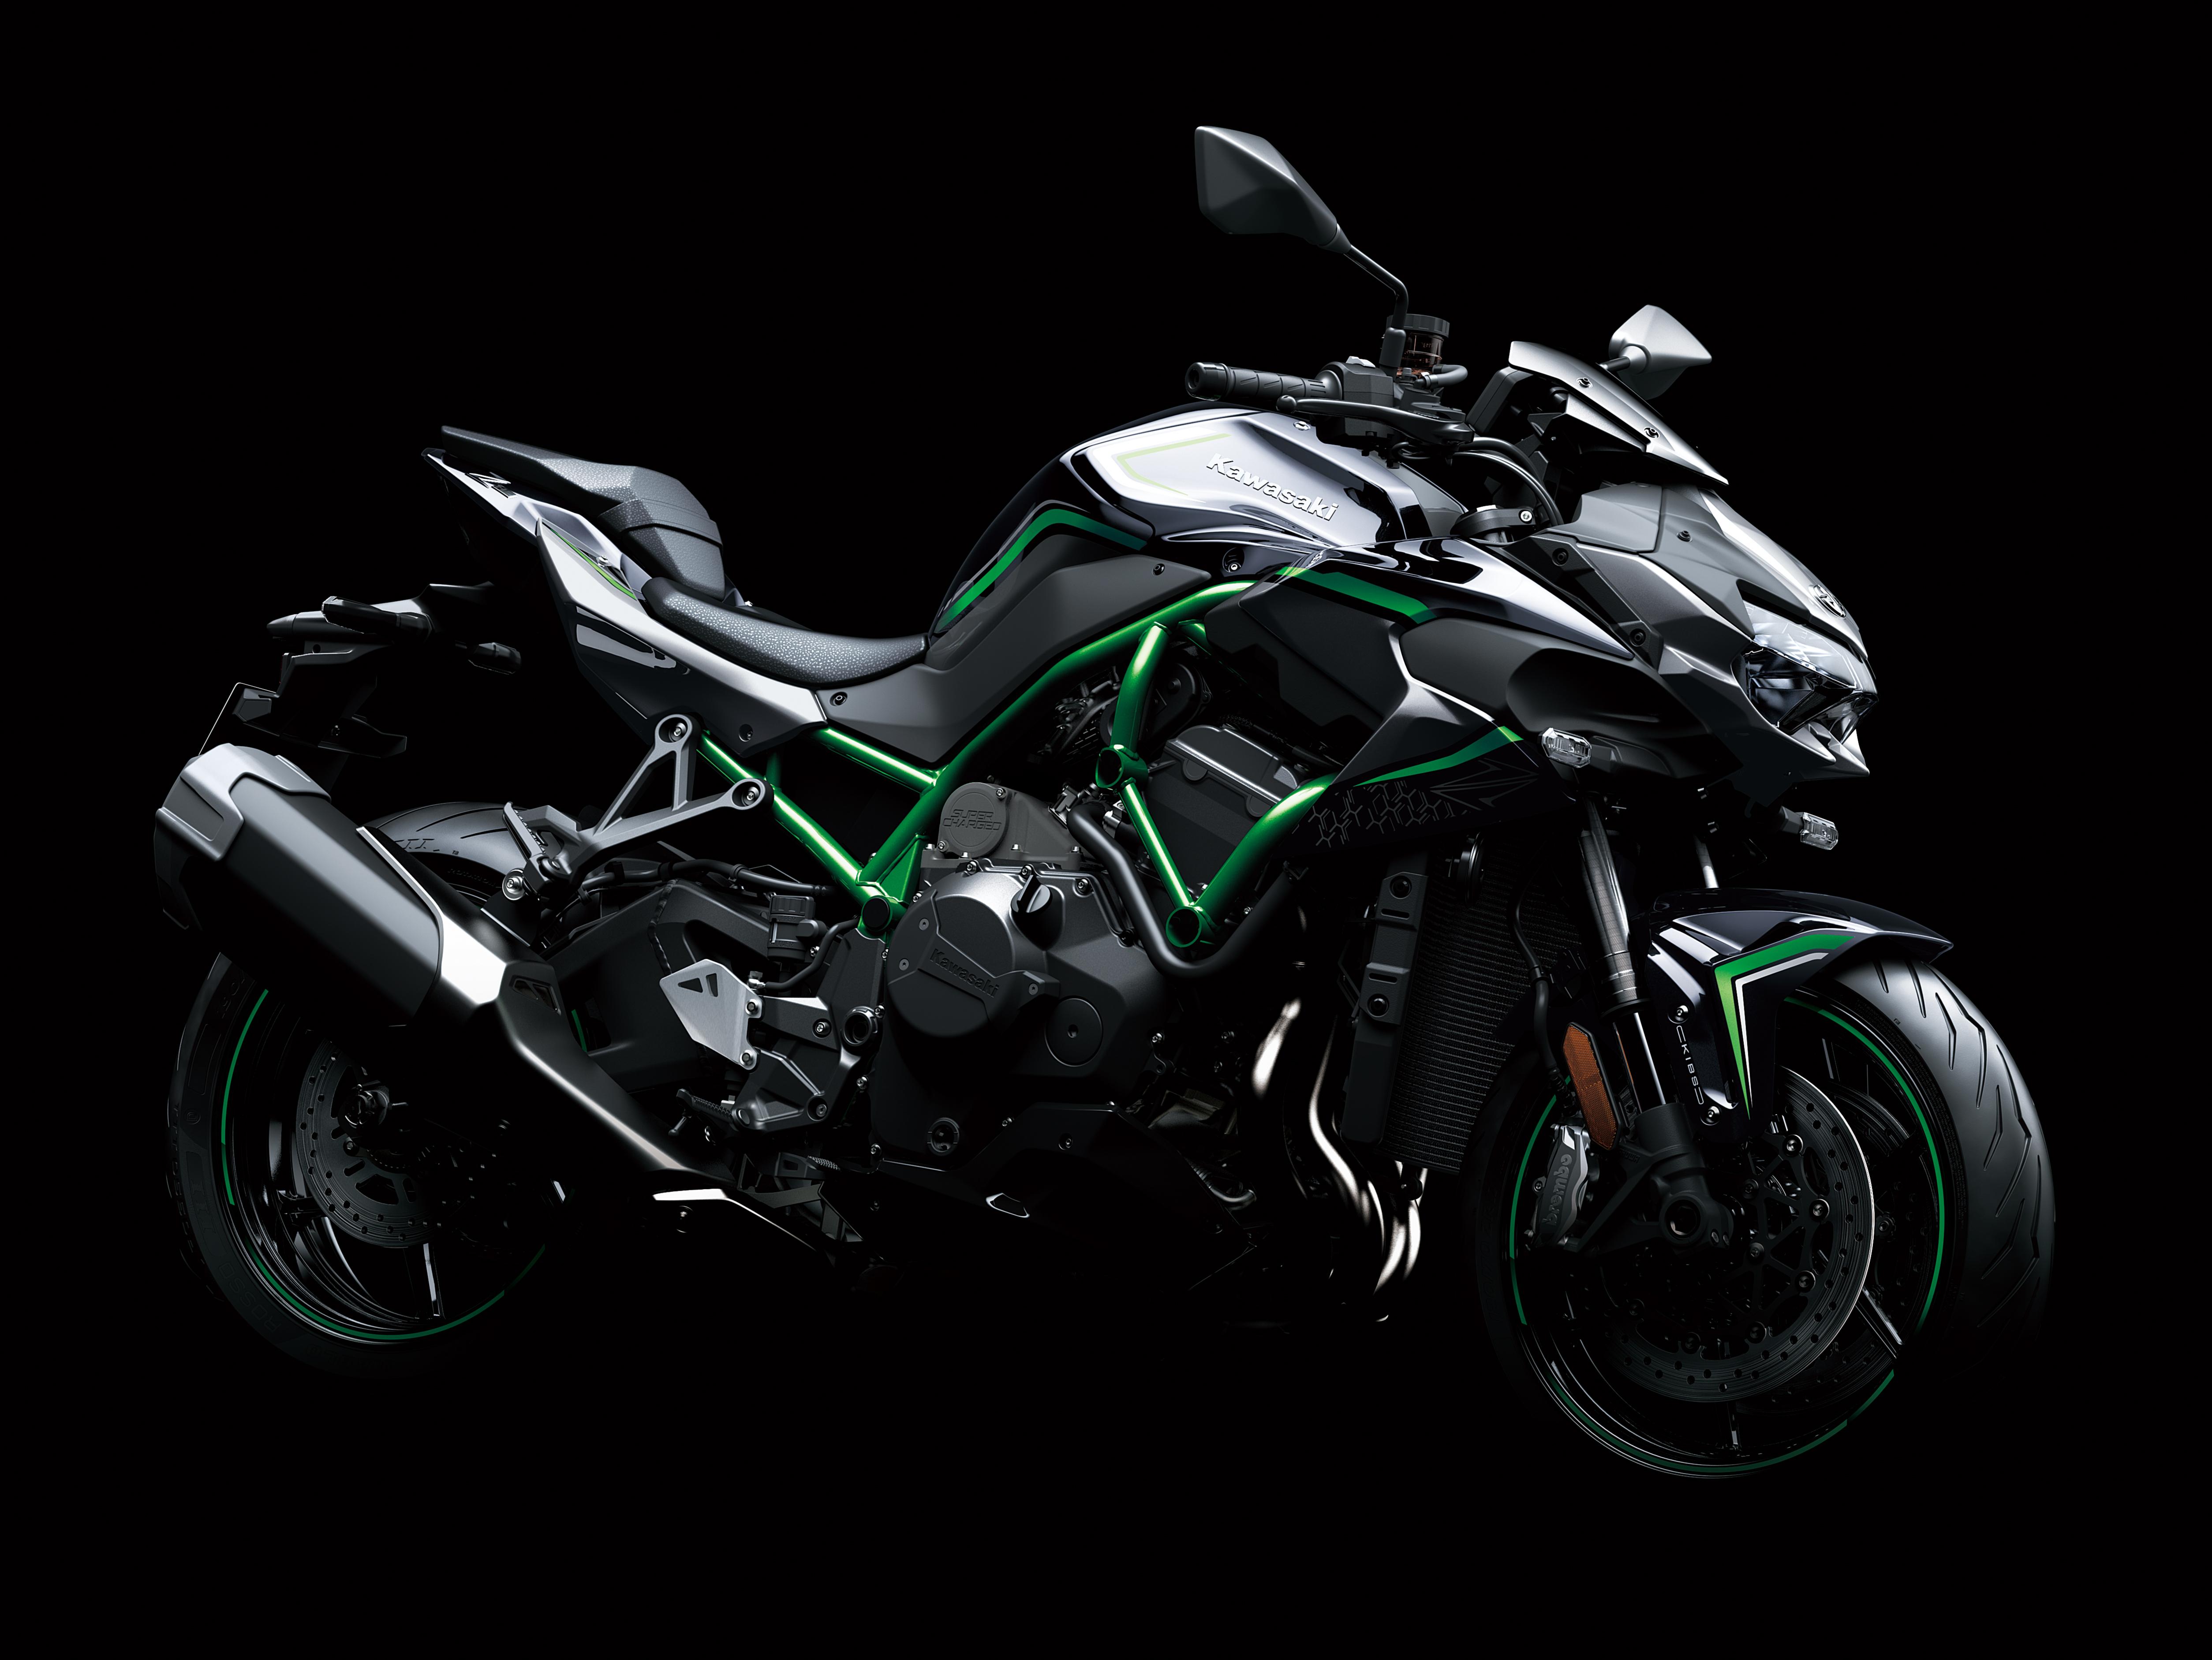 Test Ride: 2020 Kawasaki Z H2 is otherworldly | Vicarious